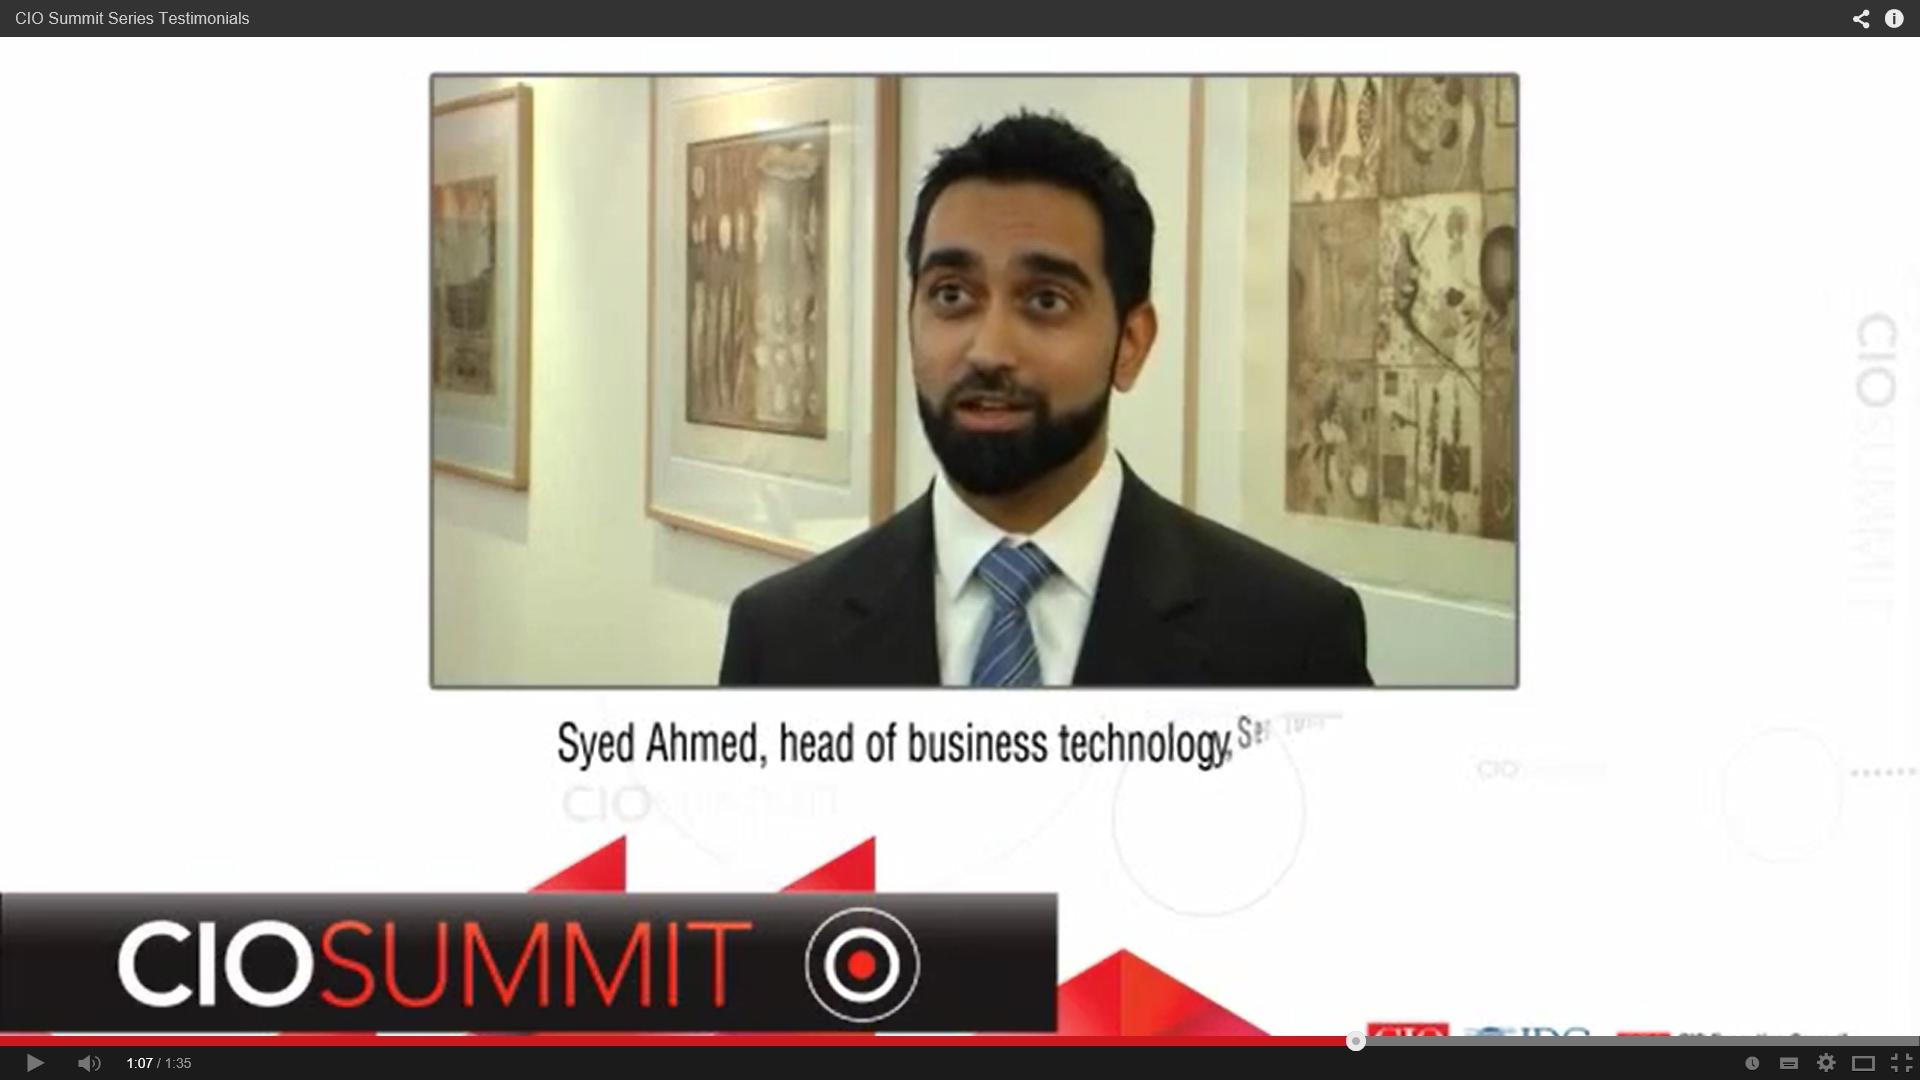 Syed Ahmed - CIO Summit Testimonial